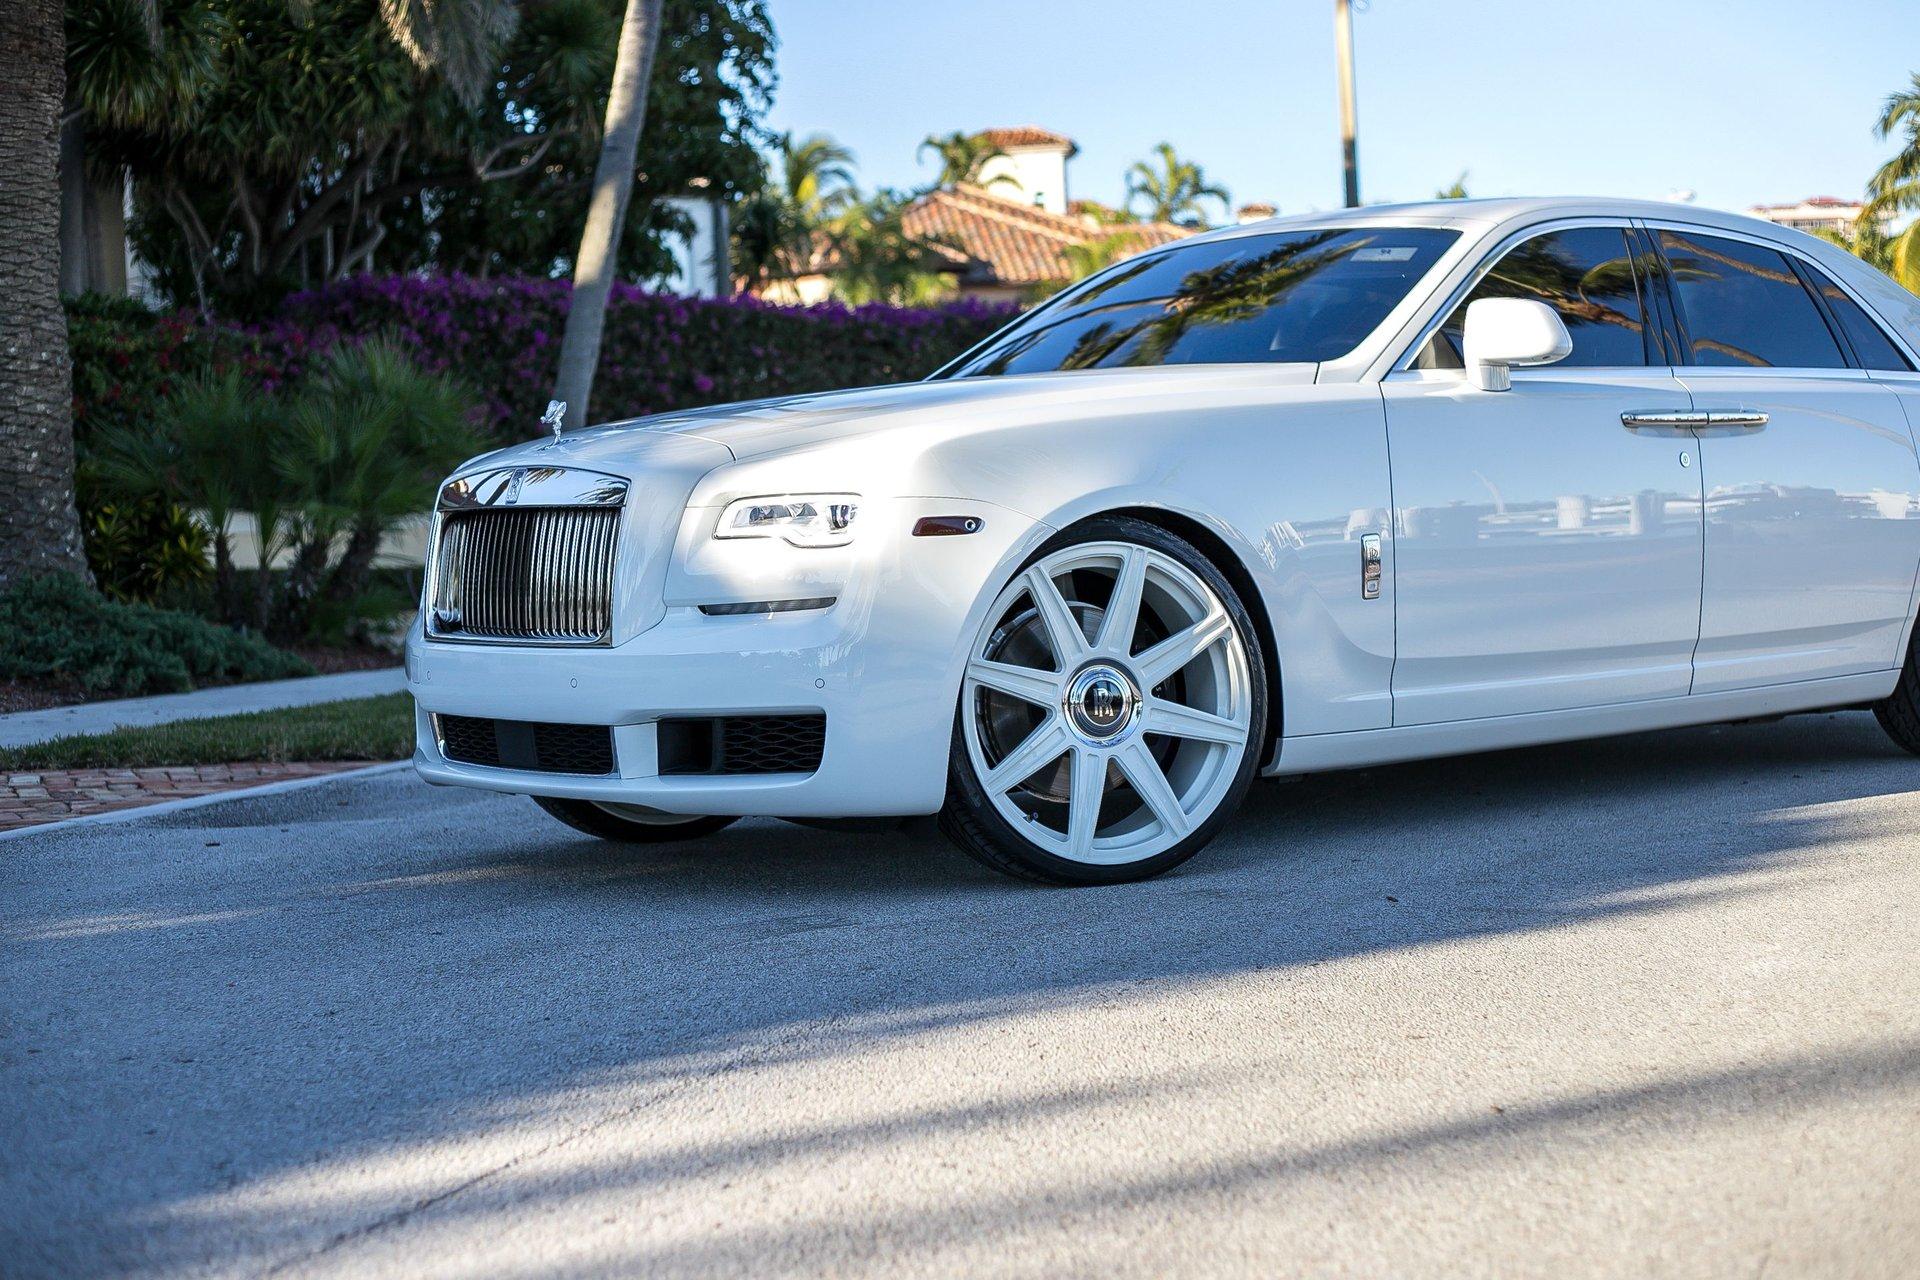 For Sale: 2018 Rolls-Royce Ghost